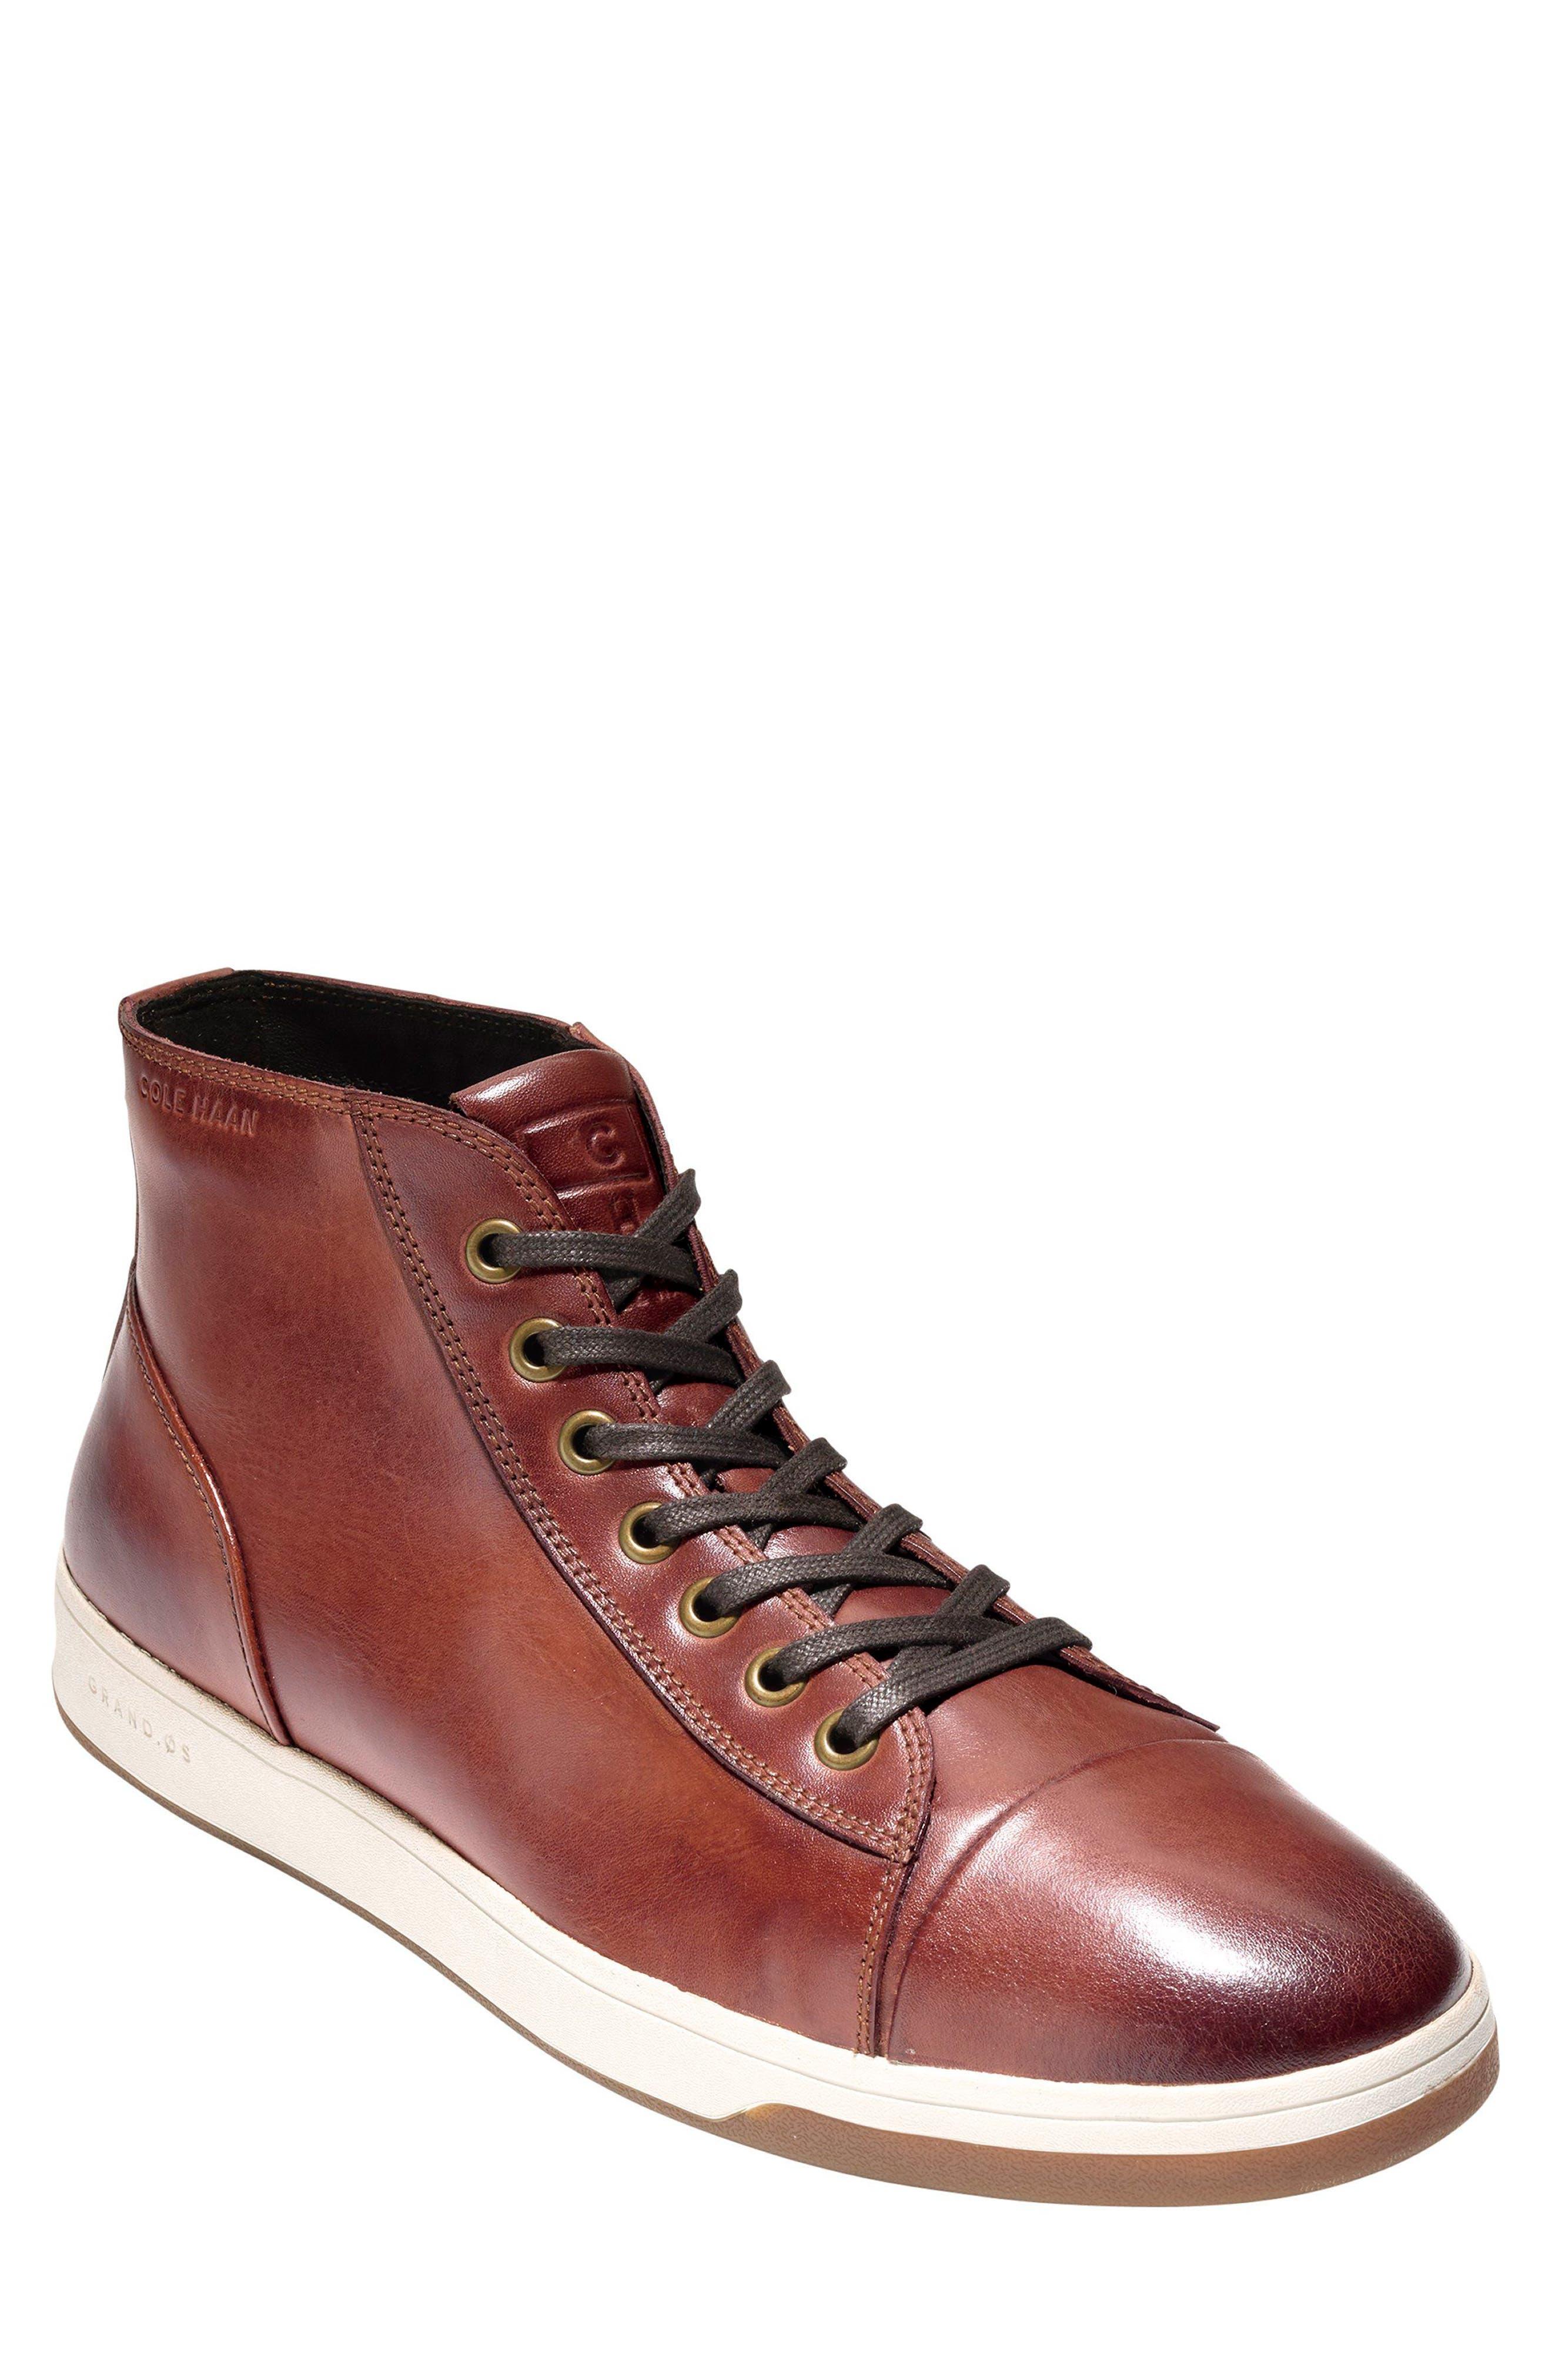 GrandPro High Top Sneaker,                         Main,                         color,